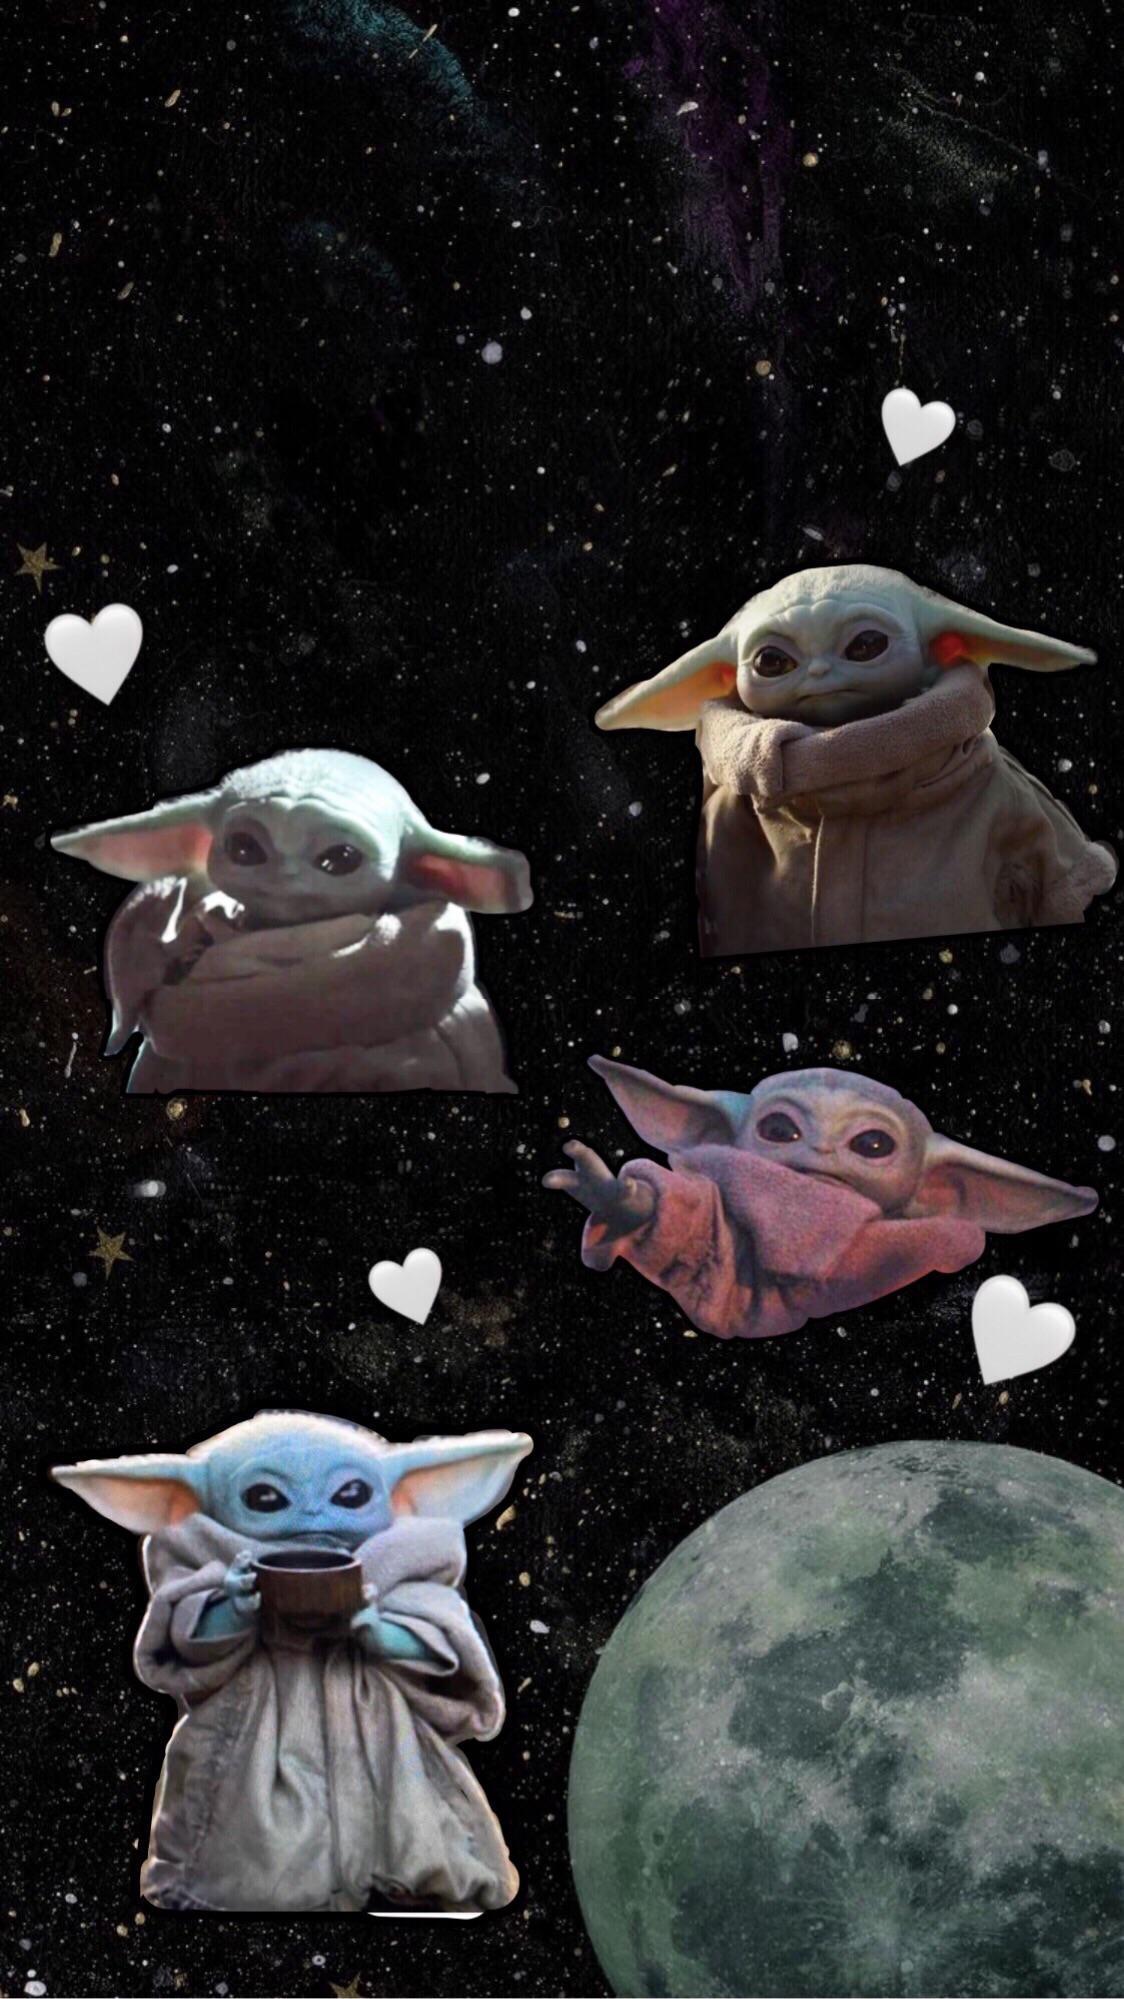 Baby Yoda Cute Wallpapers Wallpaper Cave